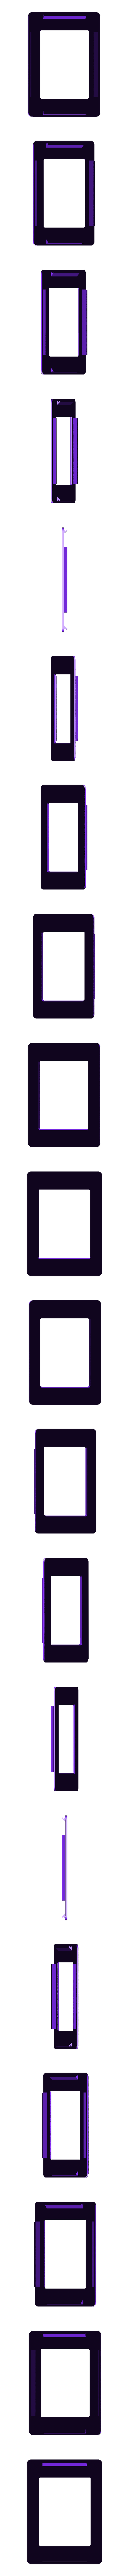 pyp-top-blank.stl Download free STL file PyPortal Case • Object to 3D print, Adafruit